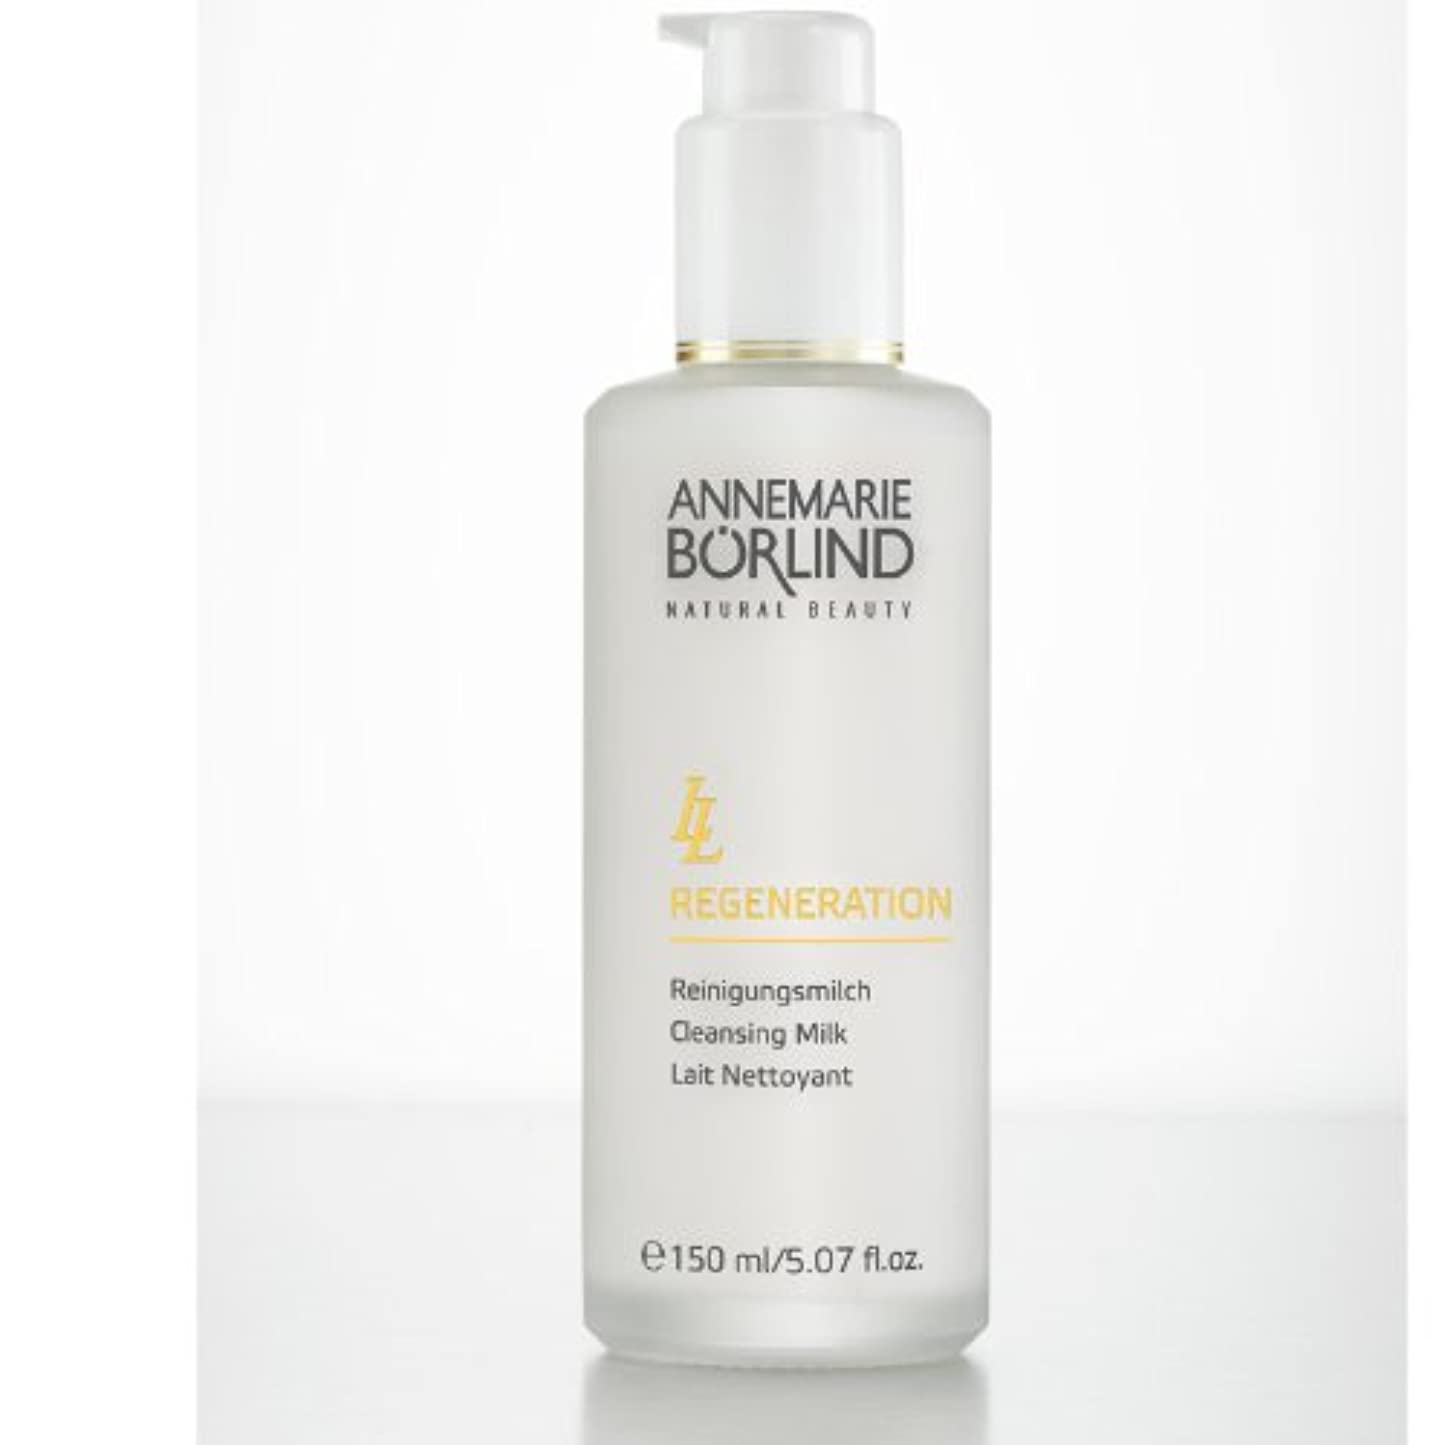 名誉製造放映AnneMarie Borlind, LL Regeneration, Cleansing Milk, 5.07 fl oz (150 ml)